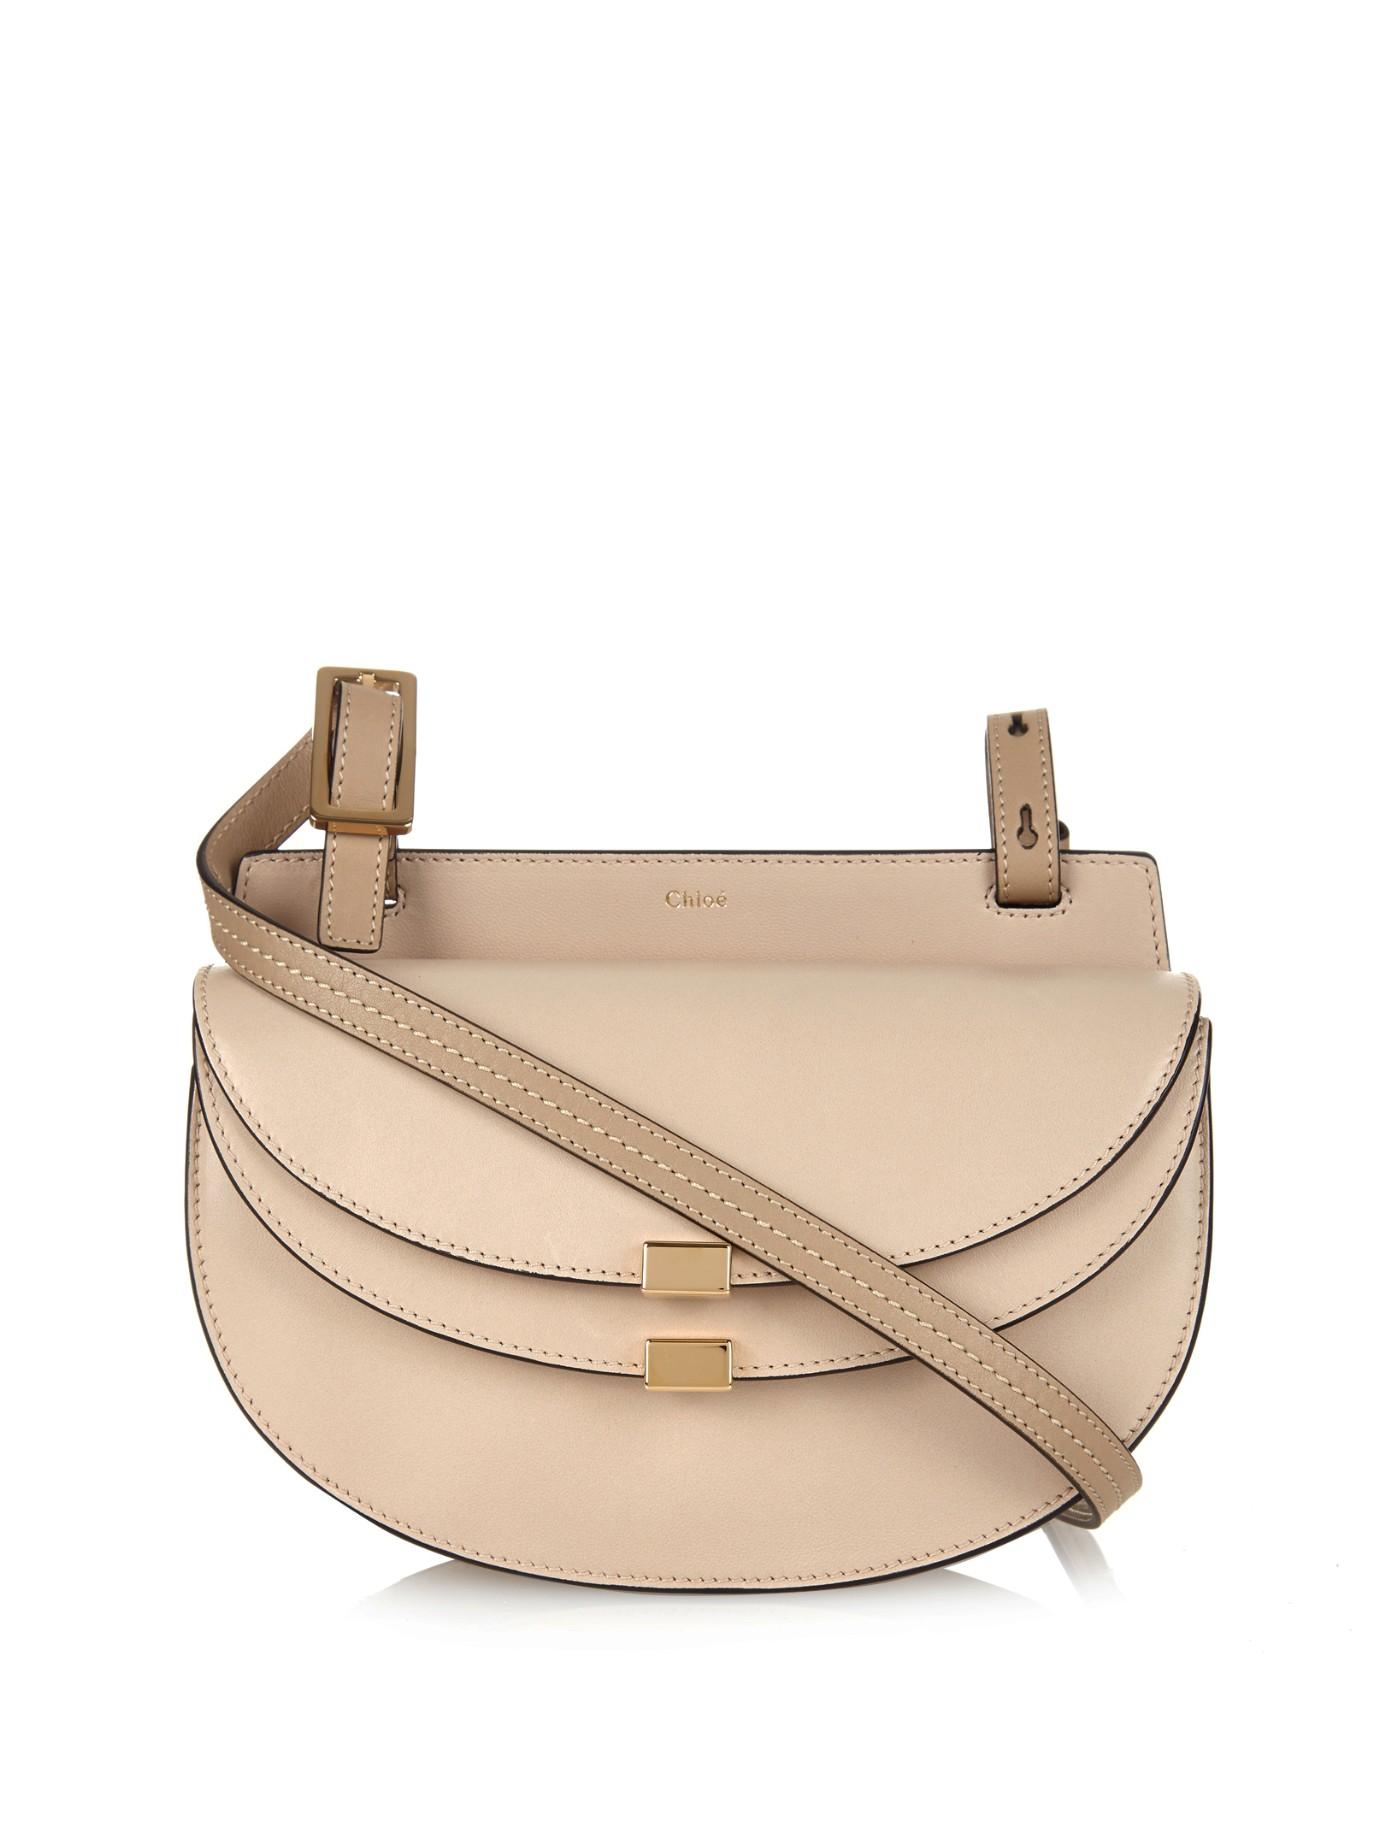 Lyst - Chloé Georgia Mini Leather Cross-Body Bag in Natural 5e5a1db755